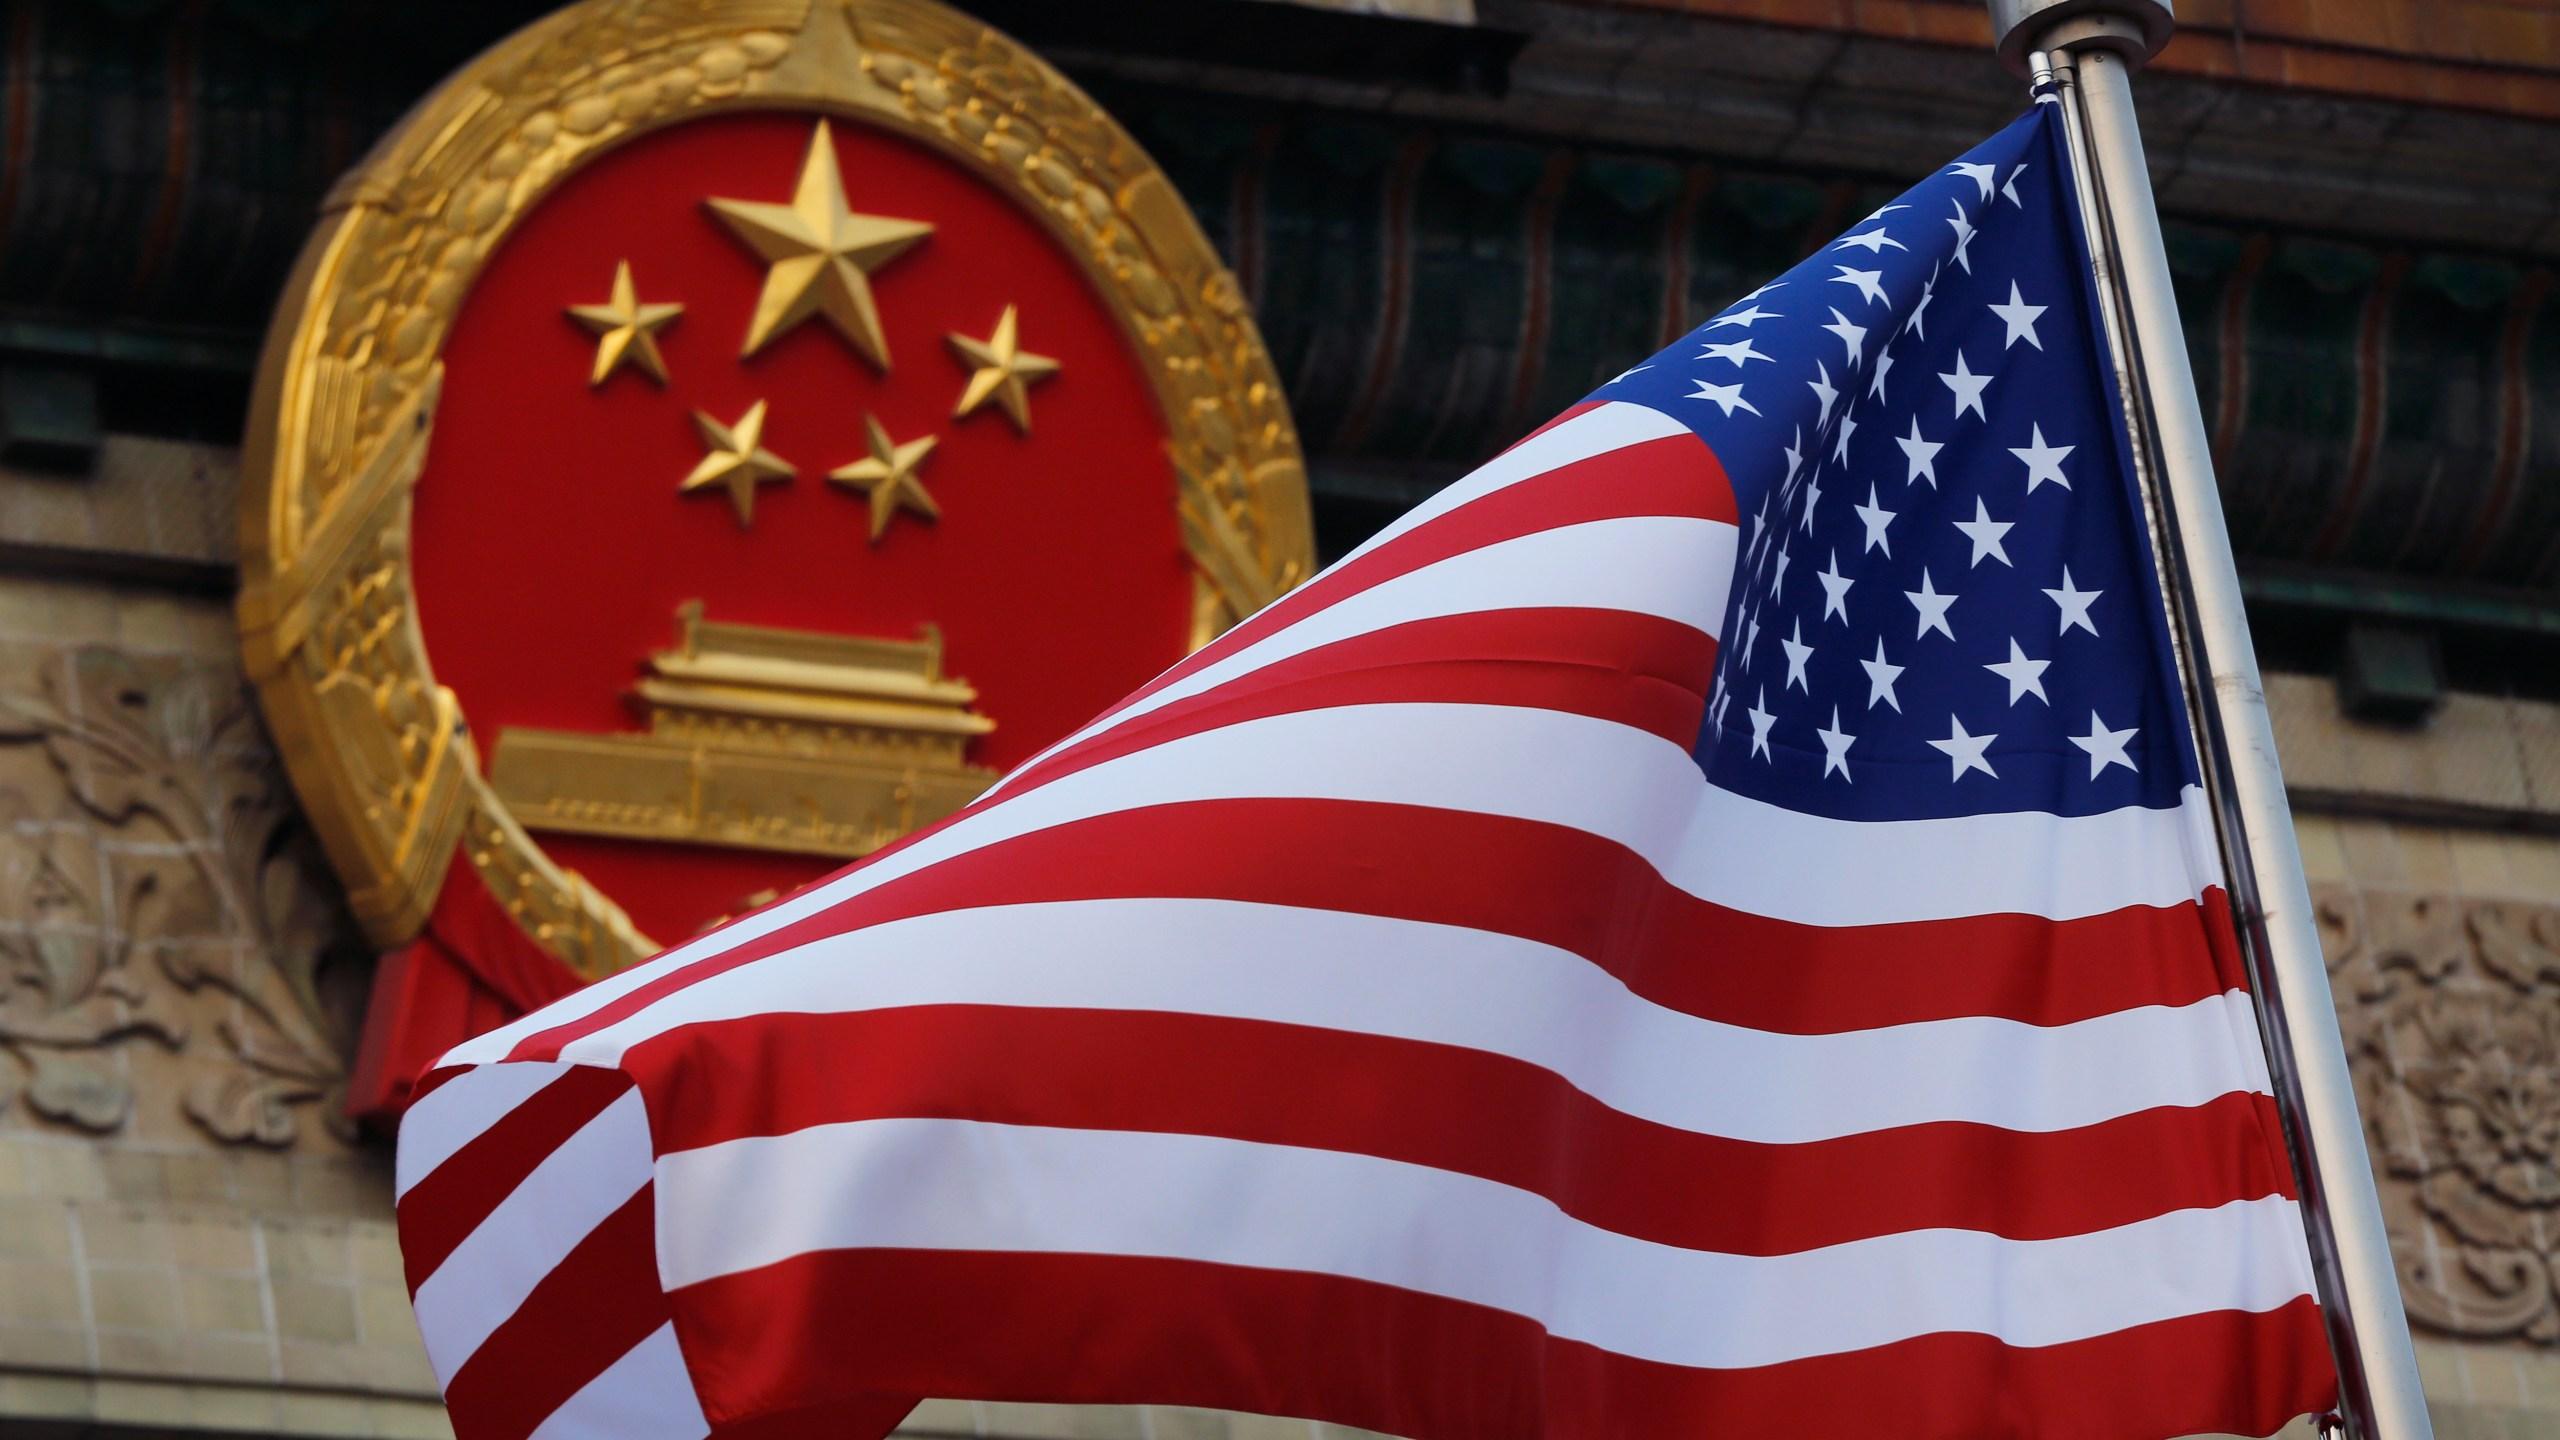 China_US_Strange_Sounds_16561-159532.jpg66297730